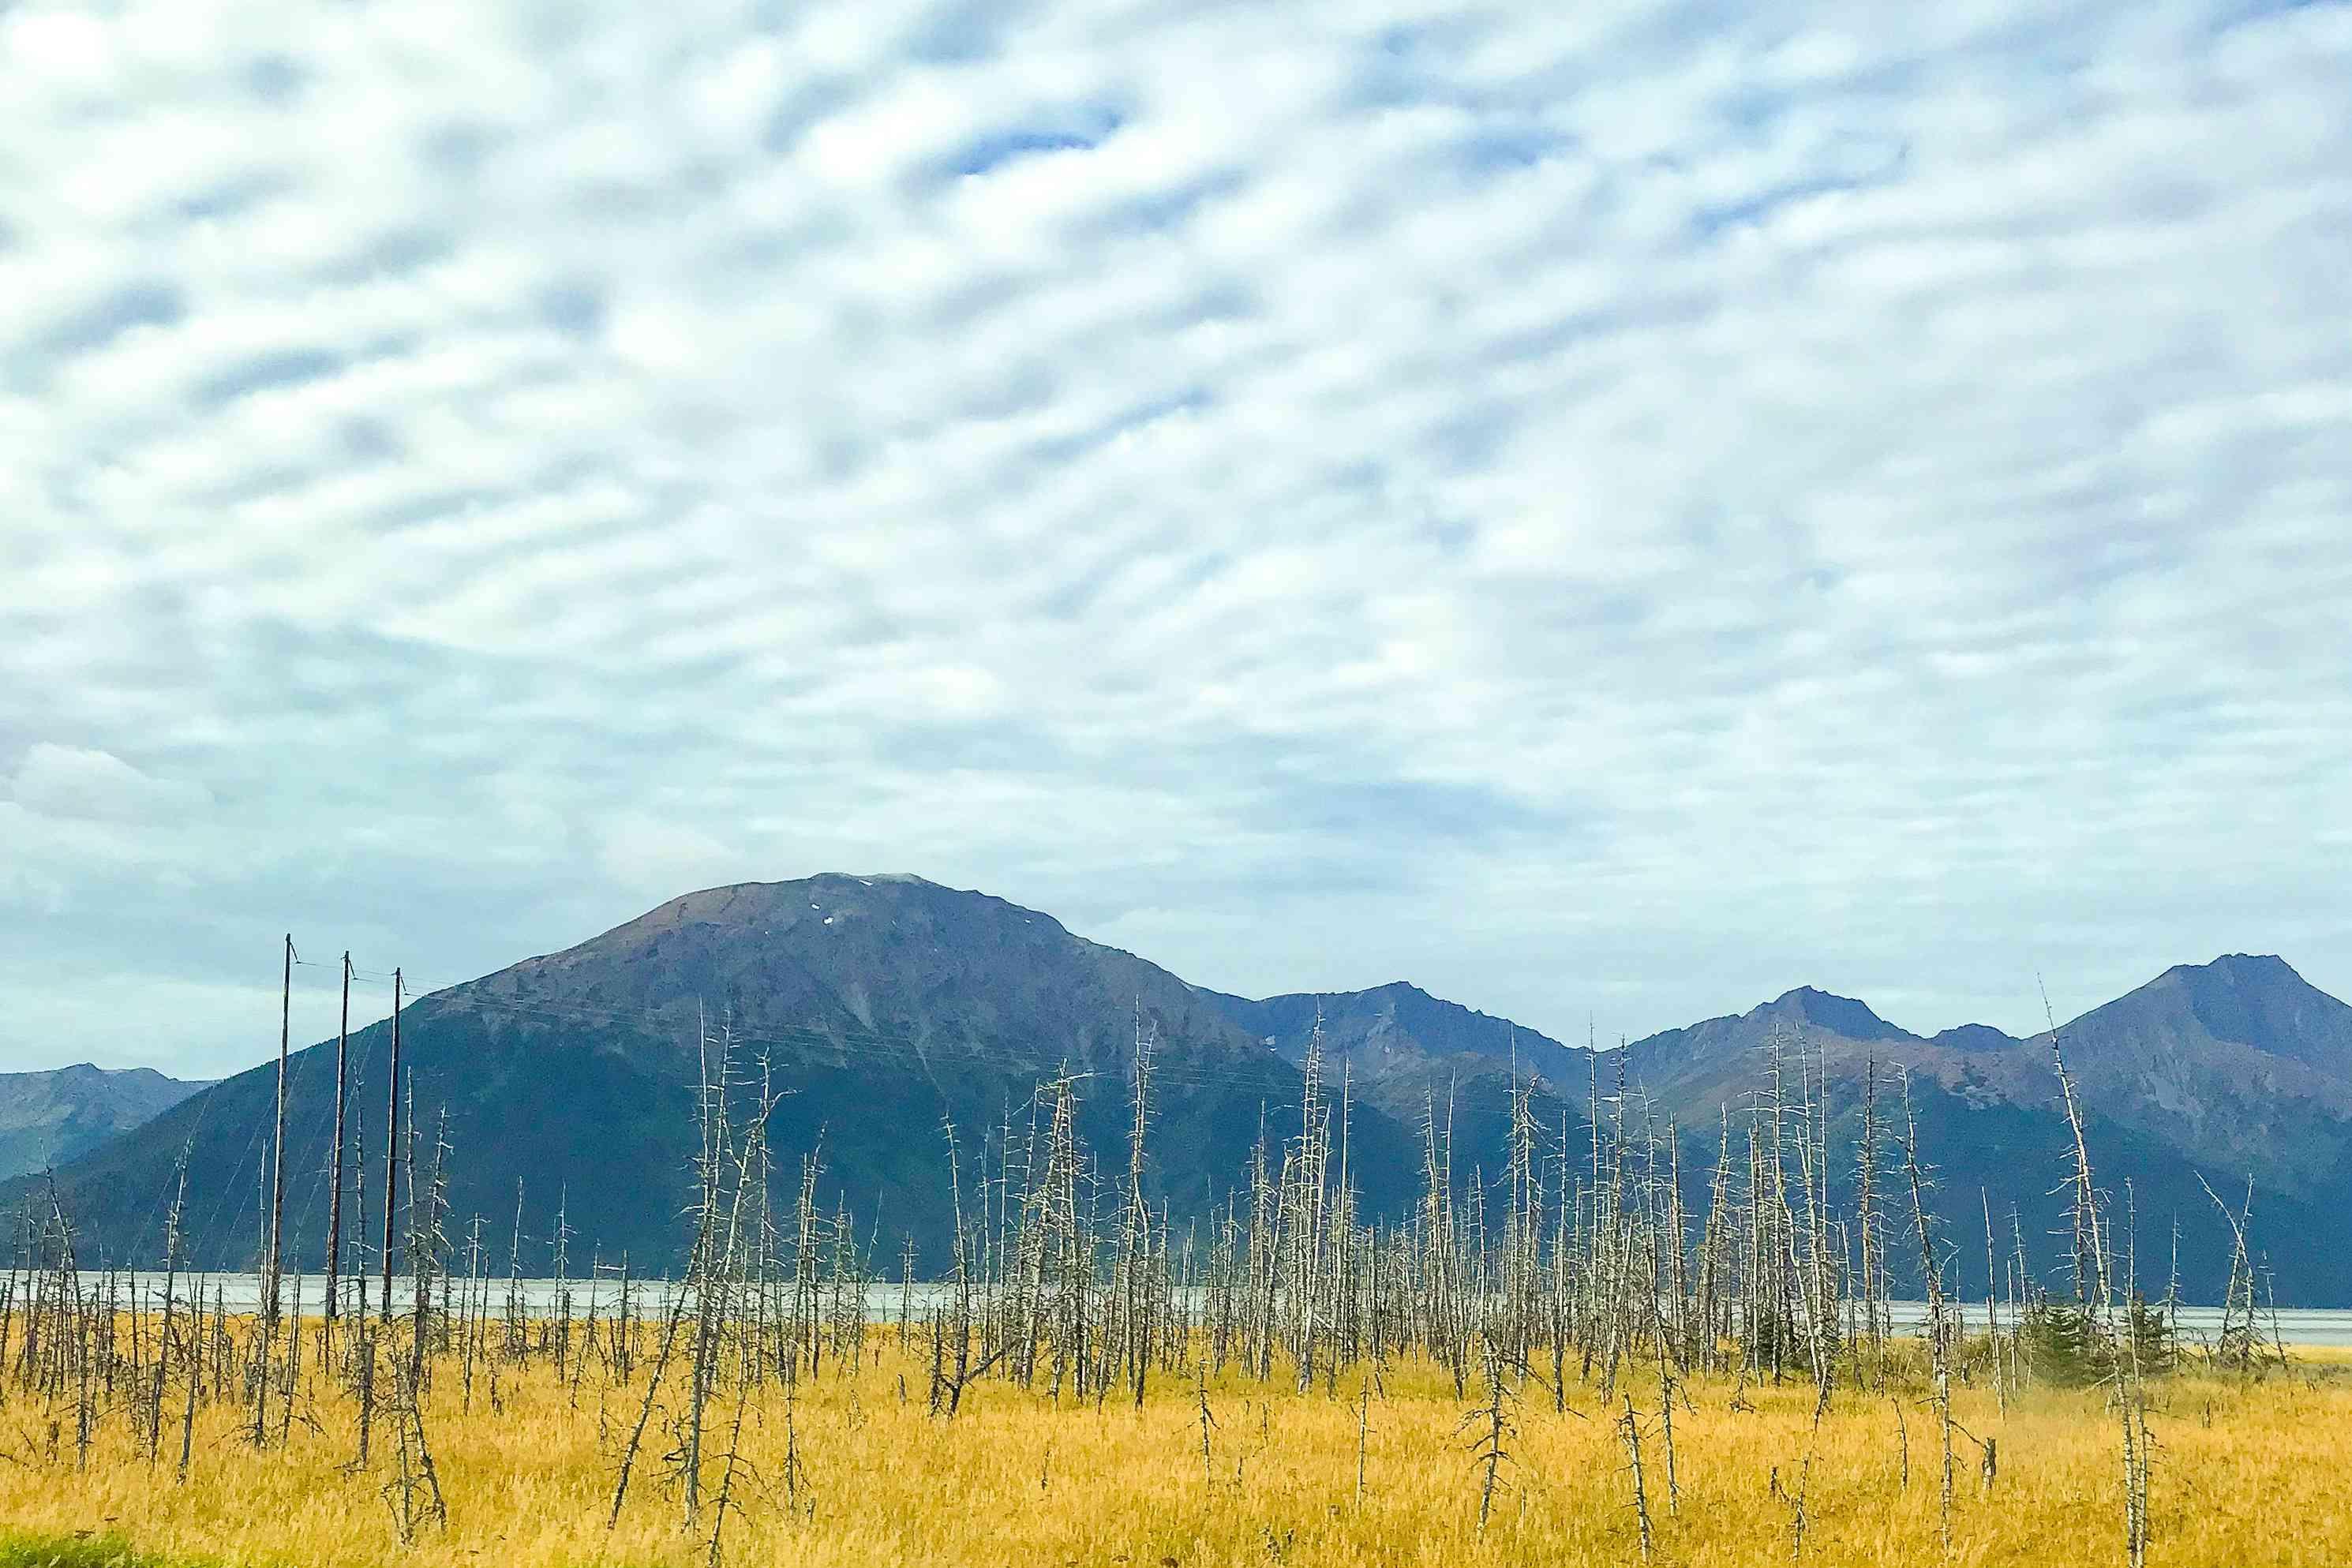 Girdwood ghost forest against a mountain backdrop in Alaska